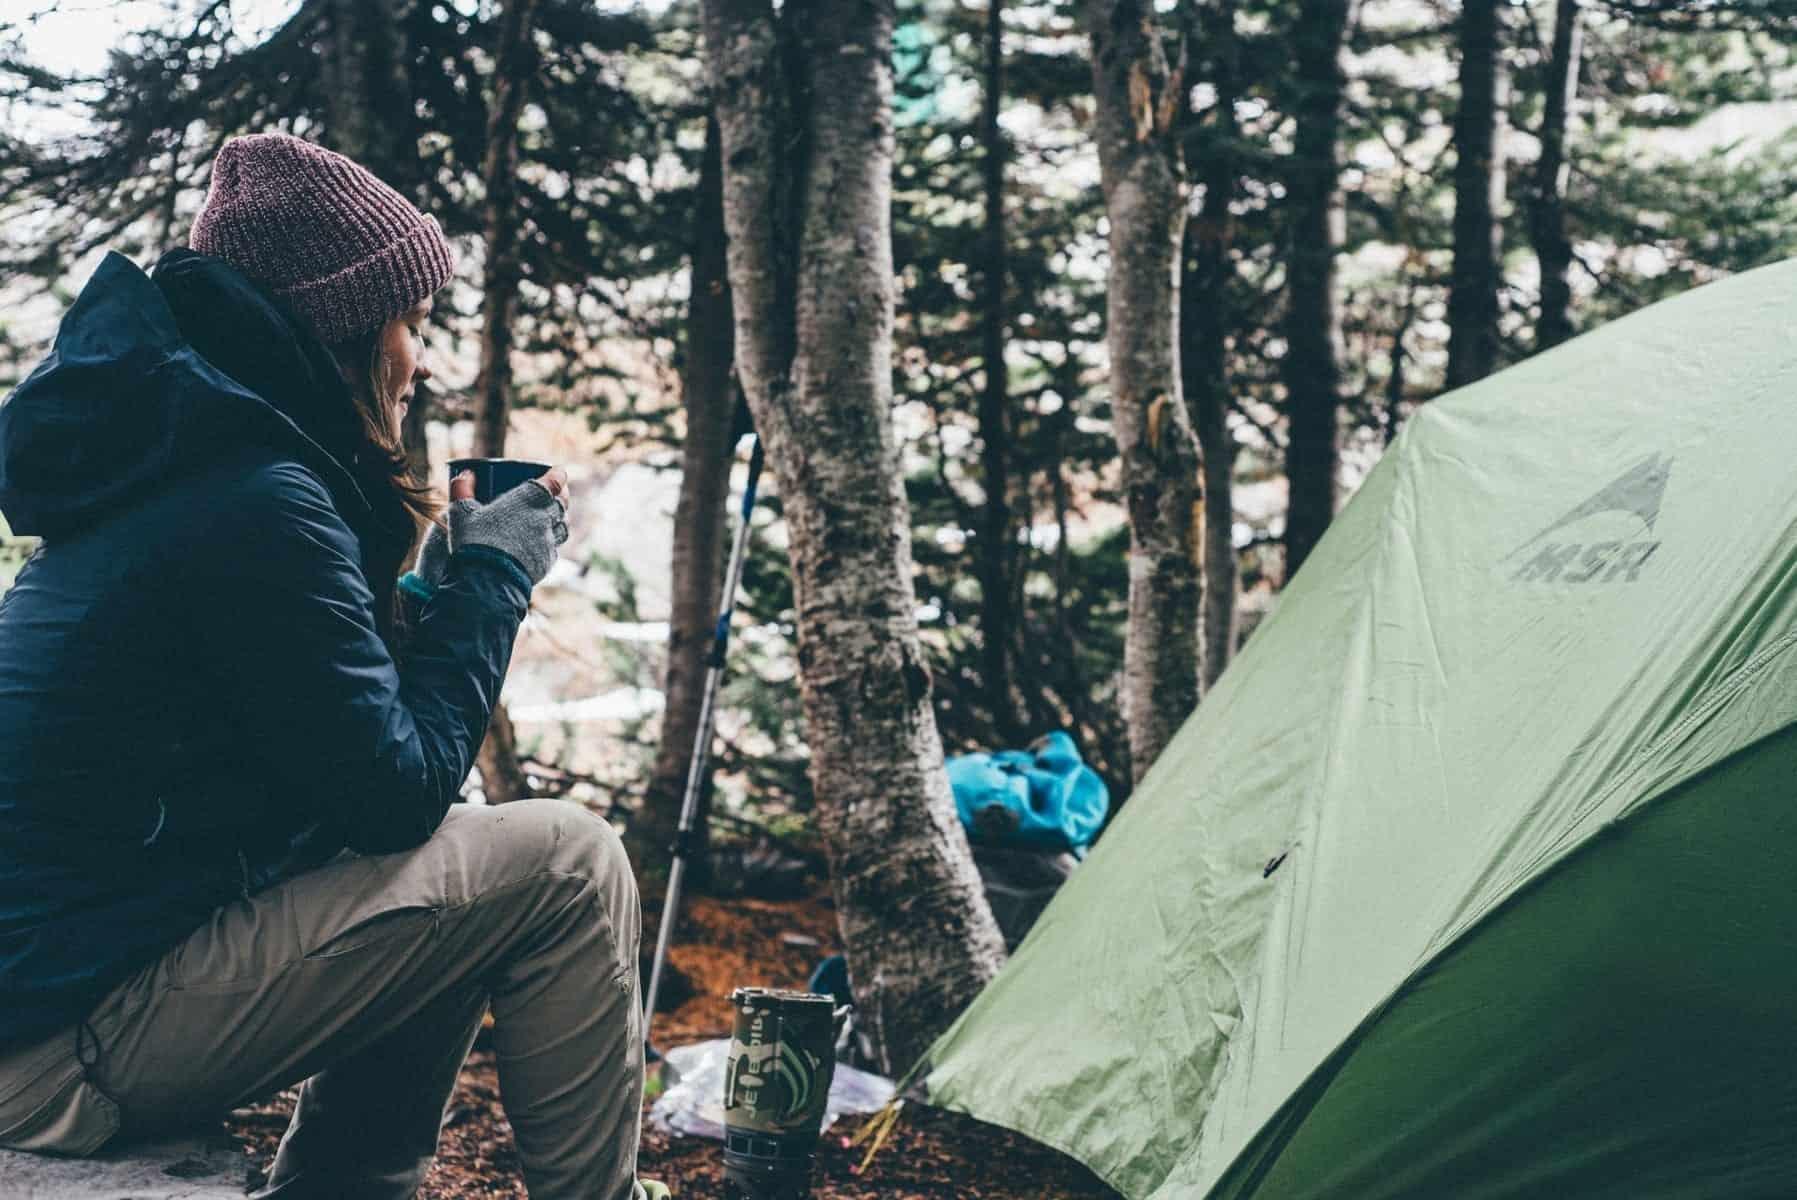 outdoor winter woman adventure camping season